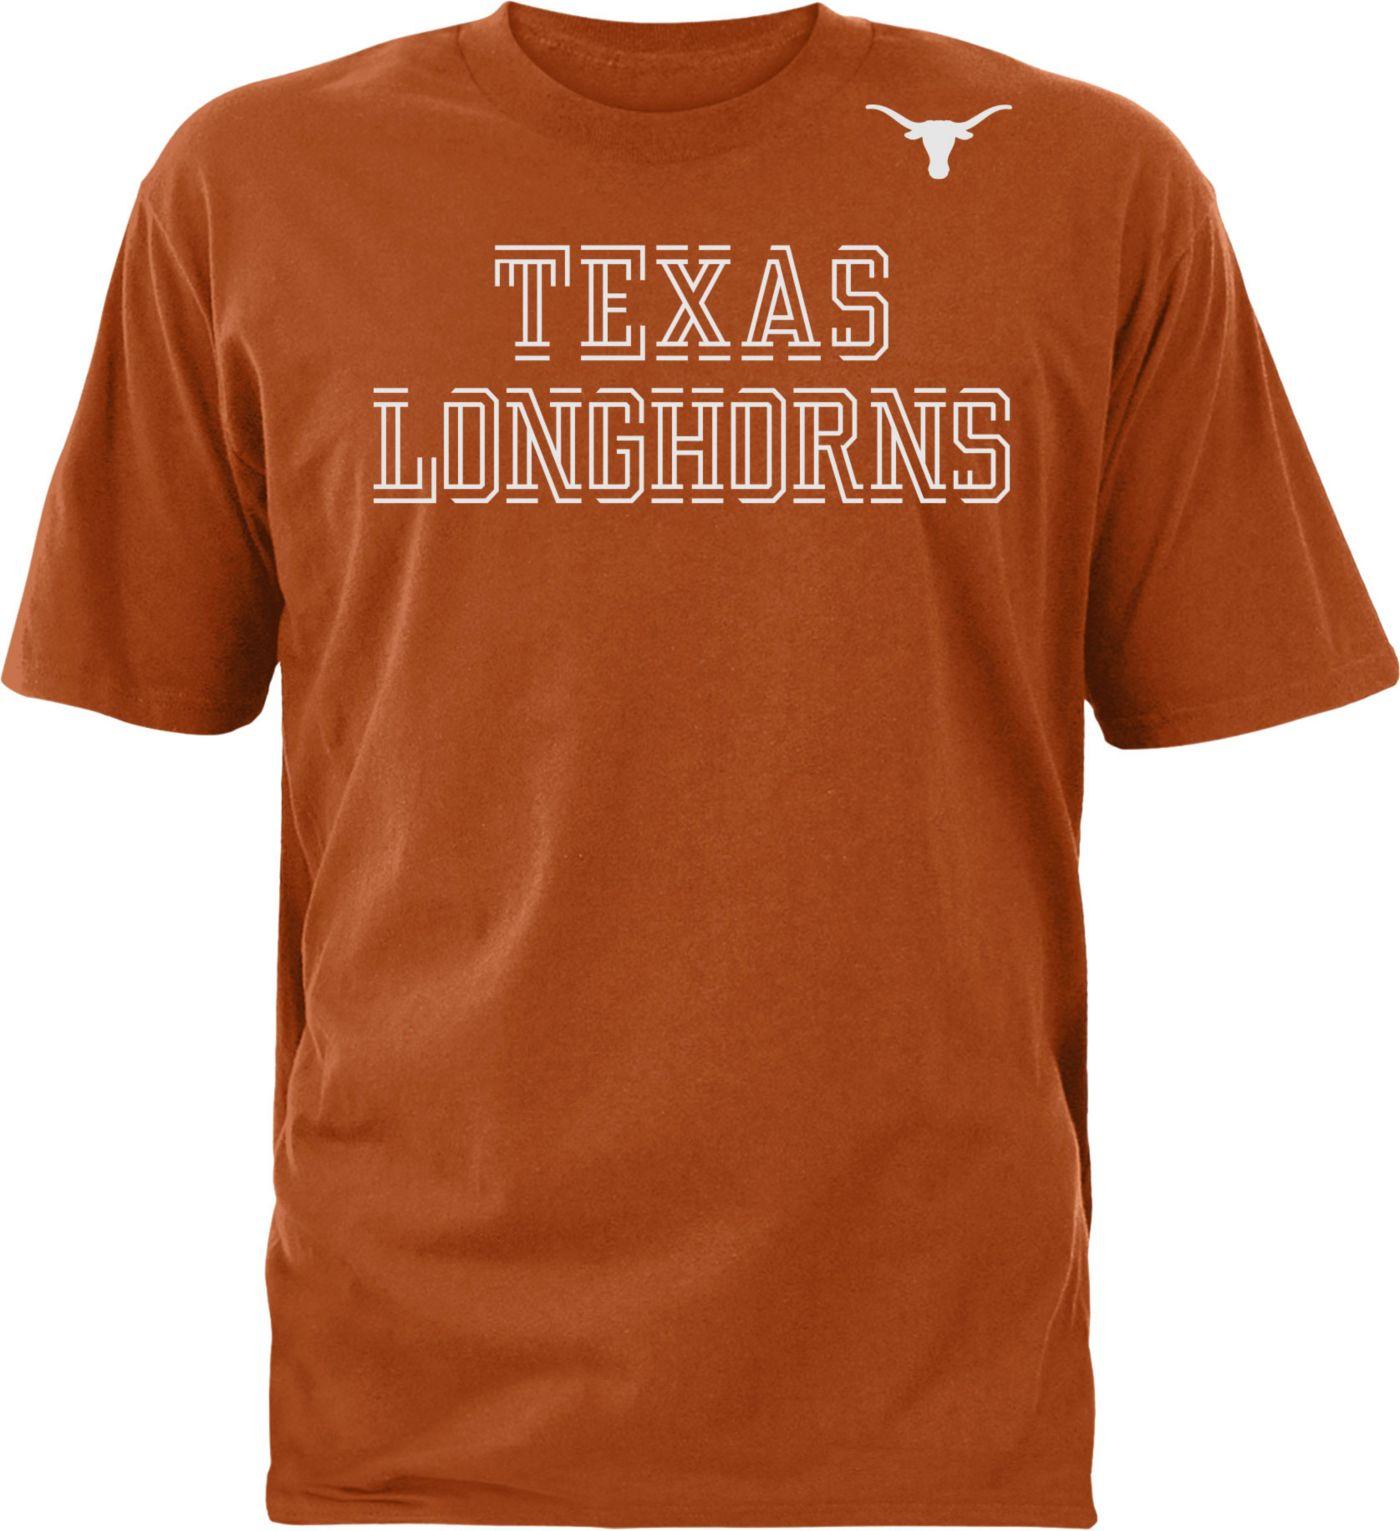 University of Texas Authentic Apparel Youth Texas Longhorns Burnt Orange Double Cut T-Shirt